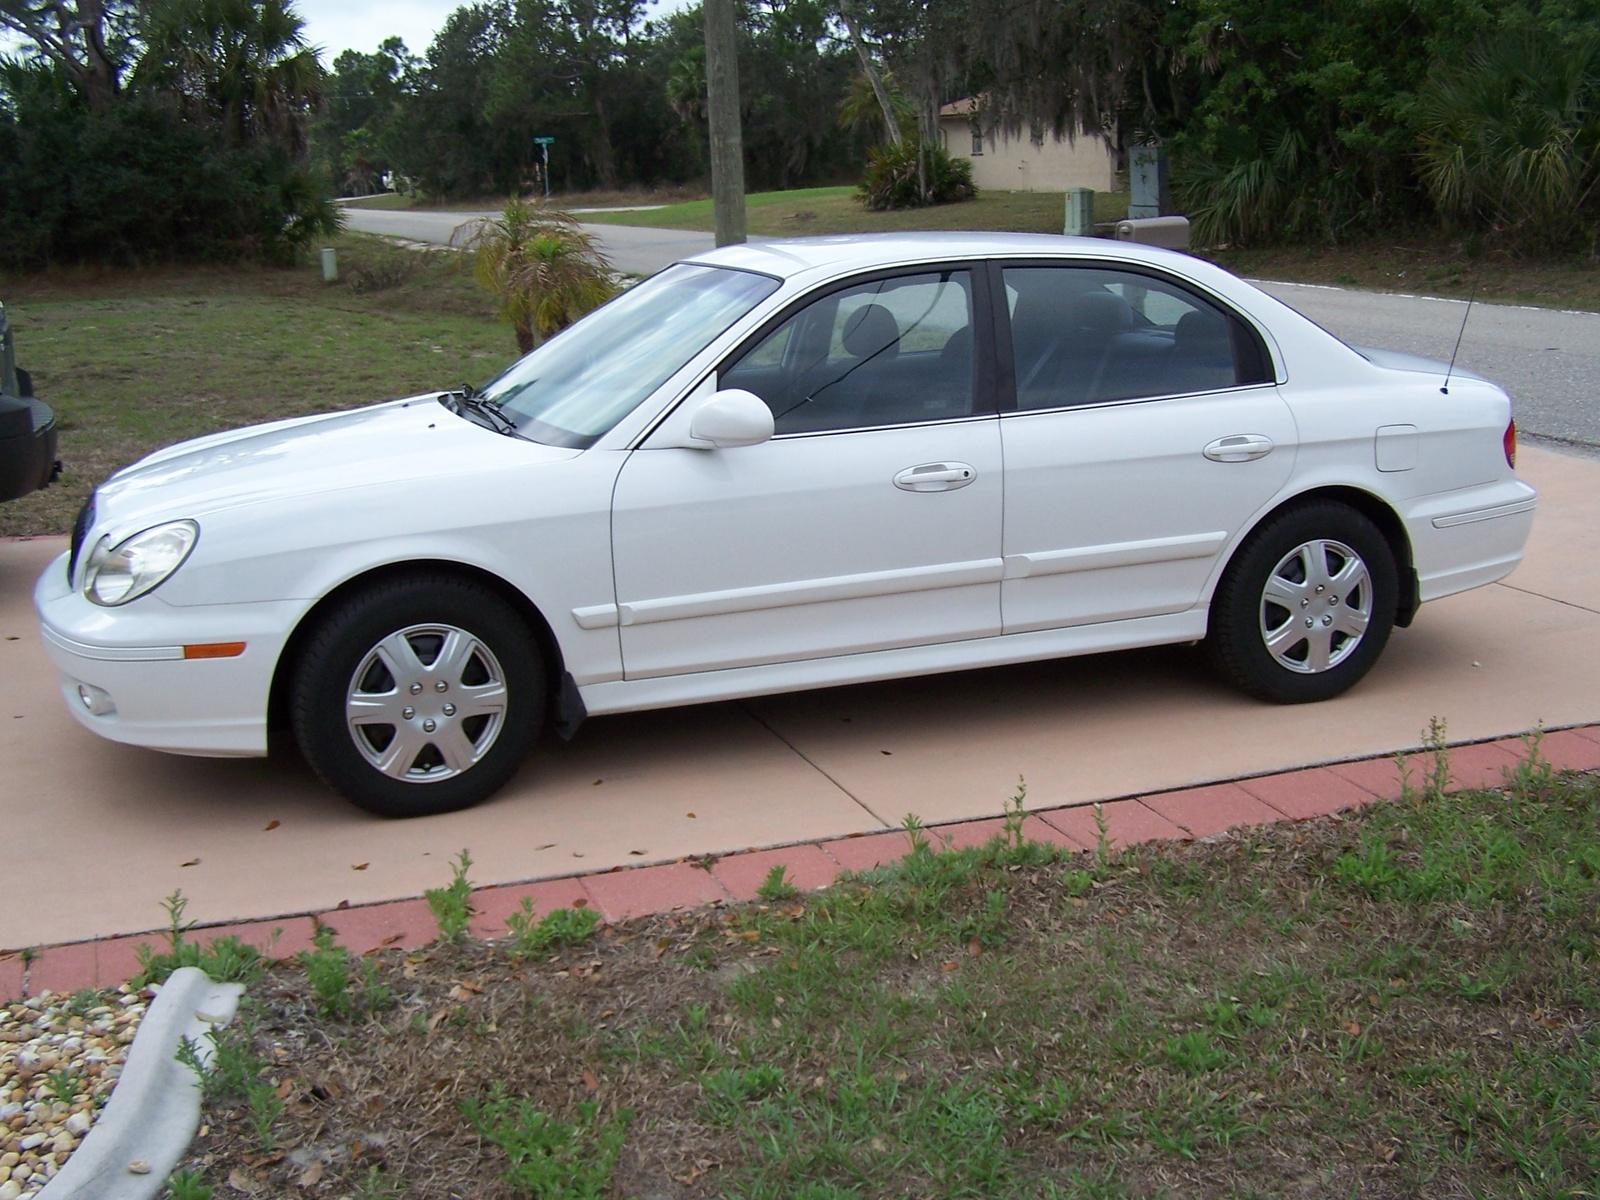 2003 Hyundai Sonata Information And Photos Zombiedrive